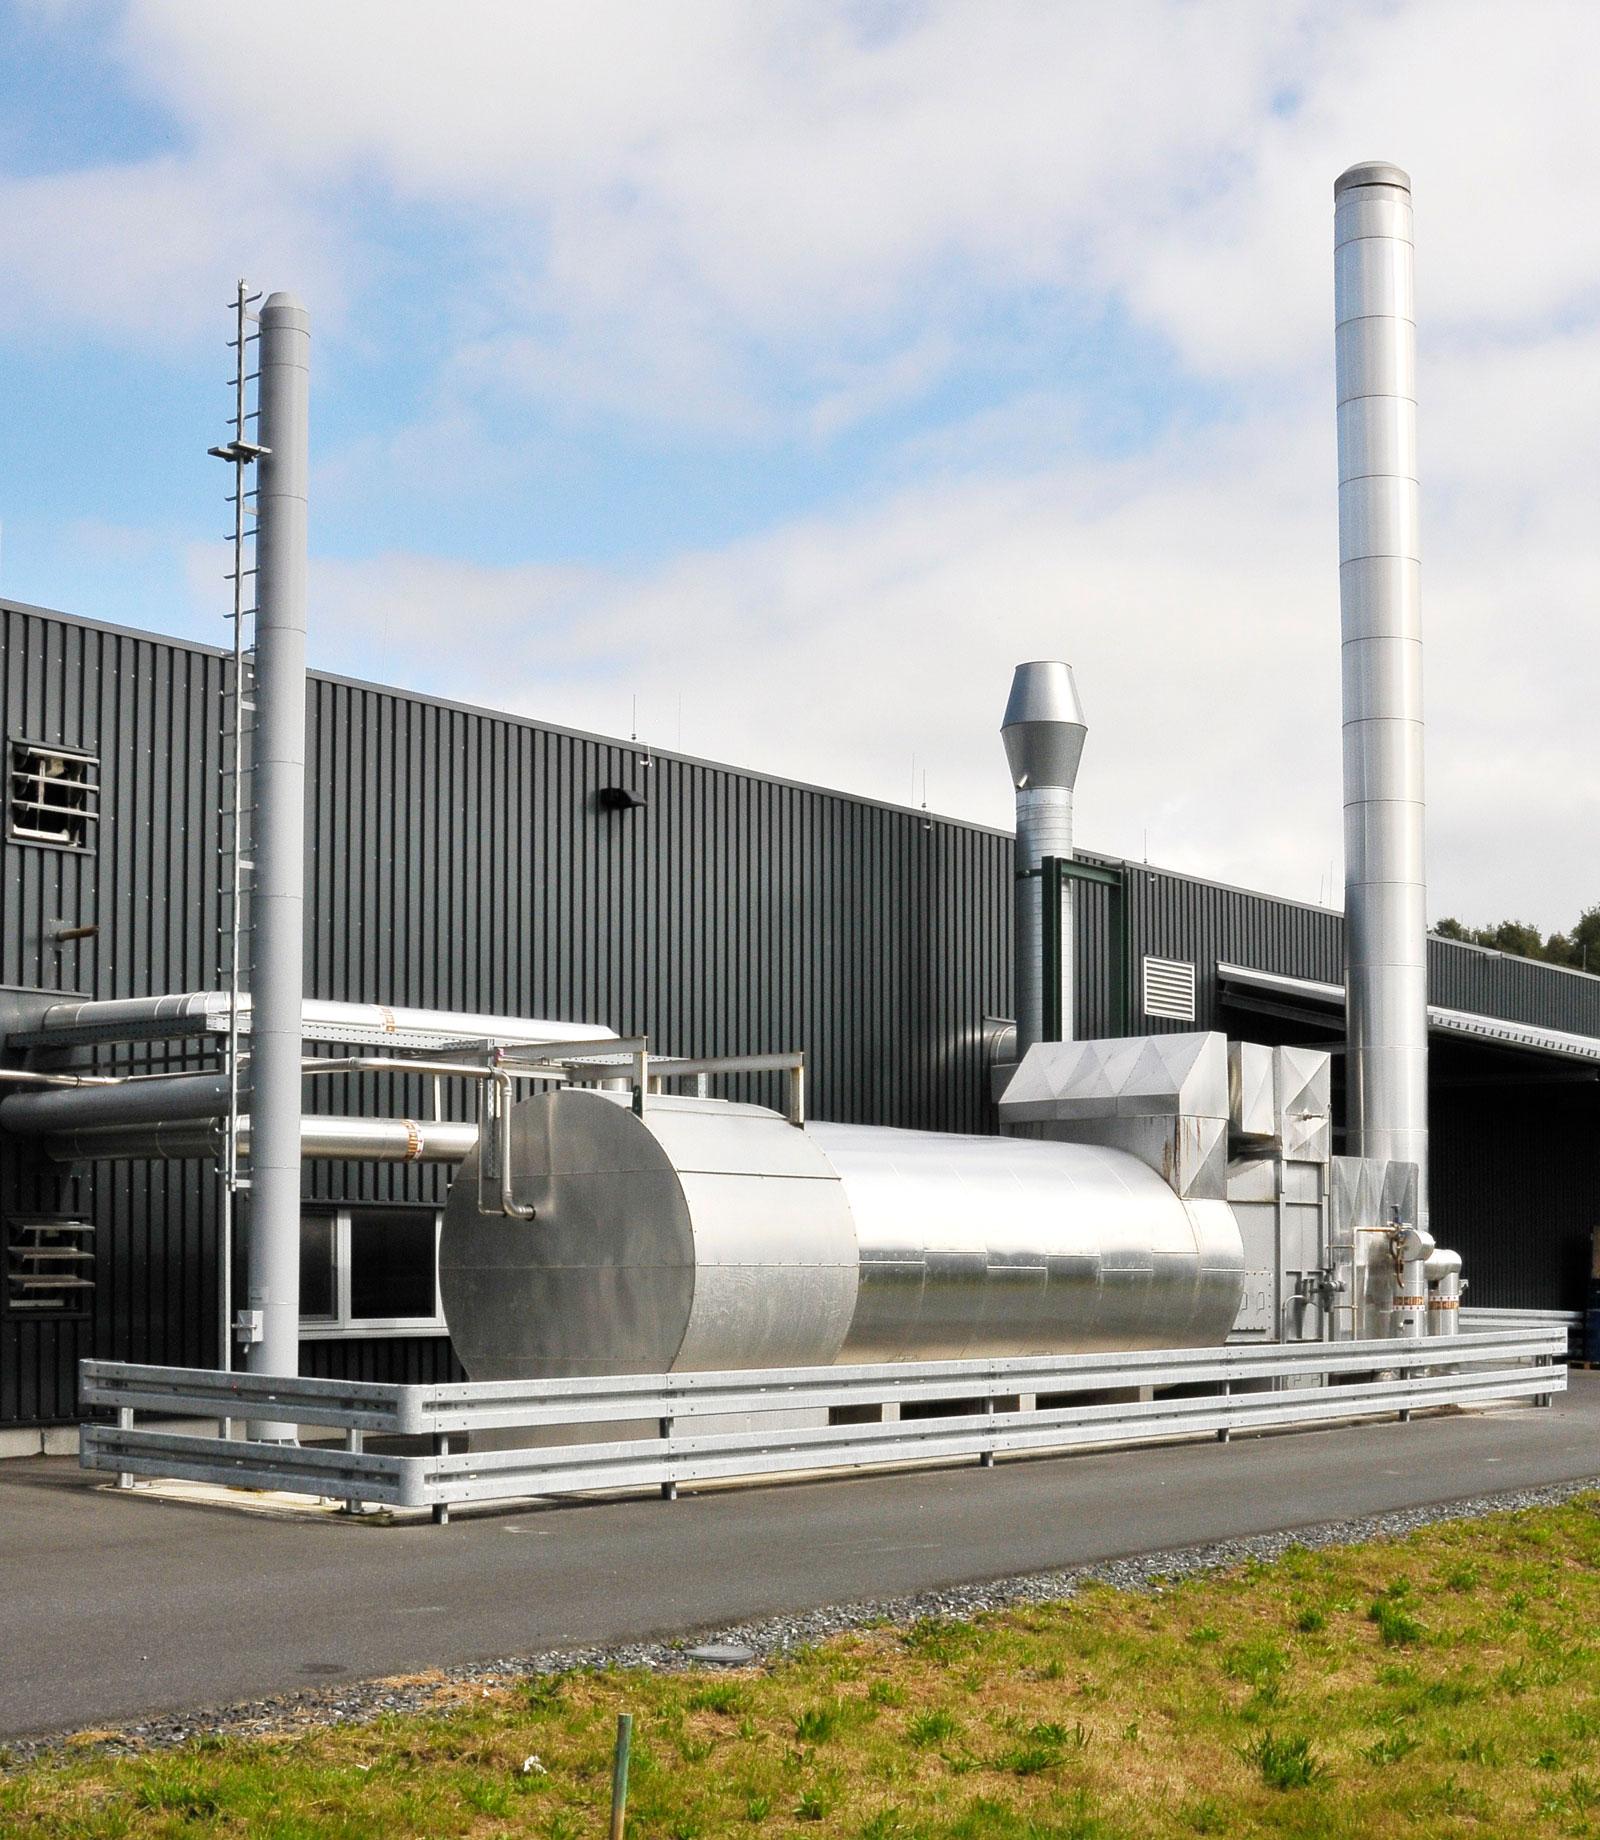 si-ka-tec-produktionsanlage-aussenaufnahme